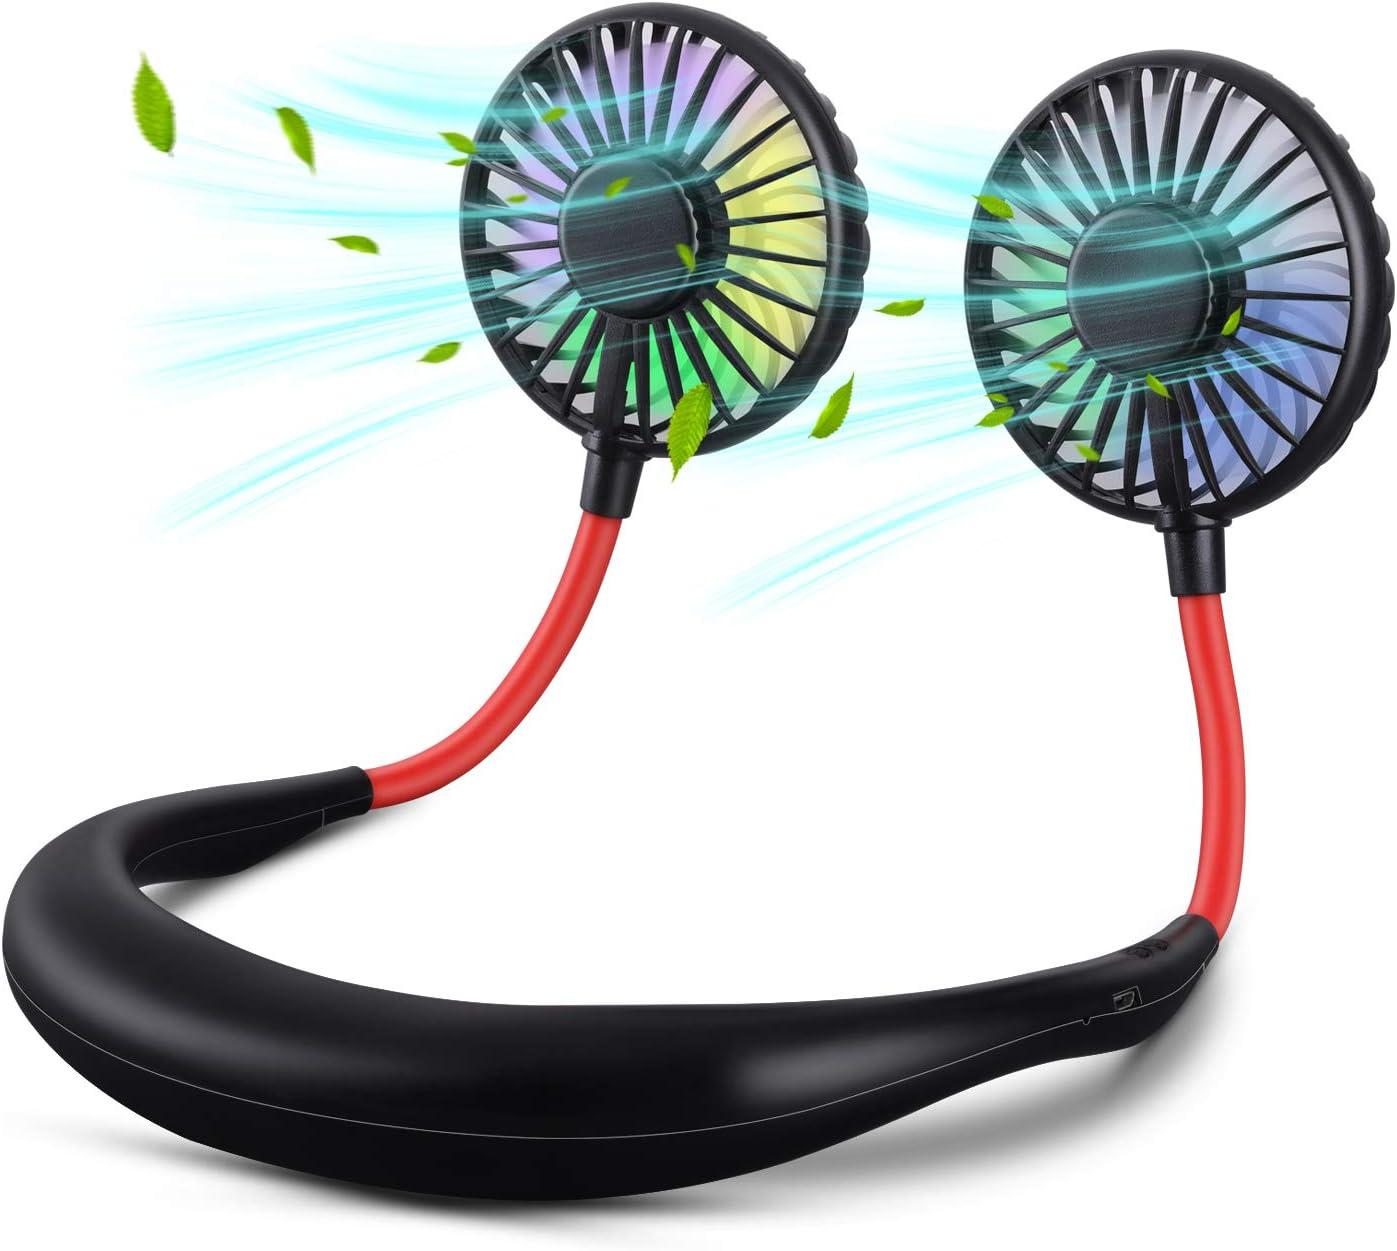 Neck Fan, XINBAOHONG Portable USB Rechargeable LED Fan Headphone Design Hand Free Personal Fan Wearable Cooler Fan with Dual Wind Head for Traveling Outdoor Office